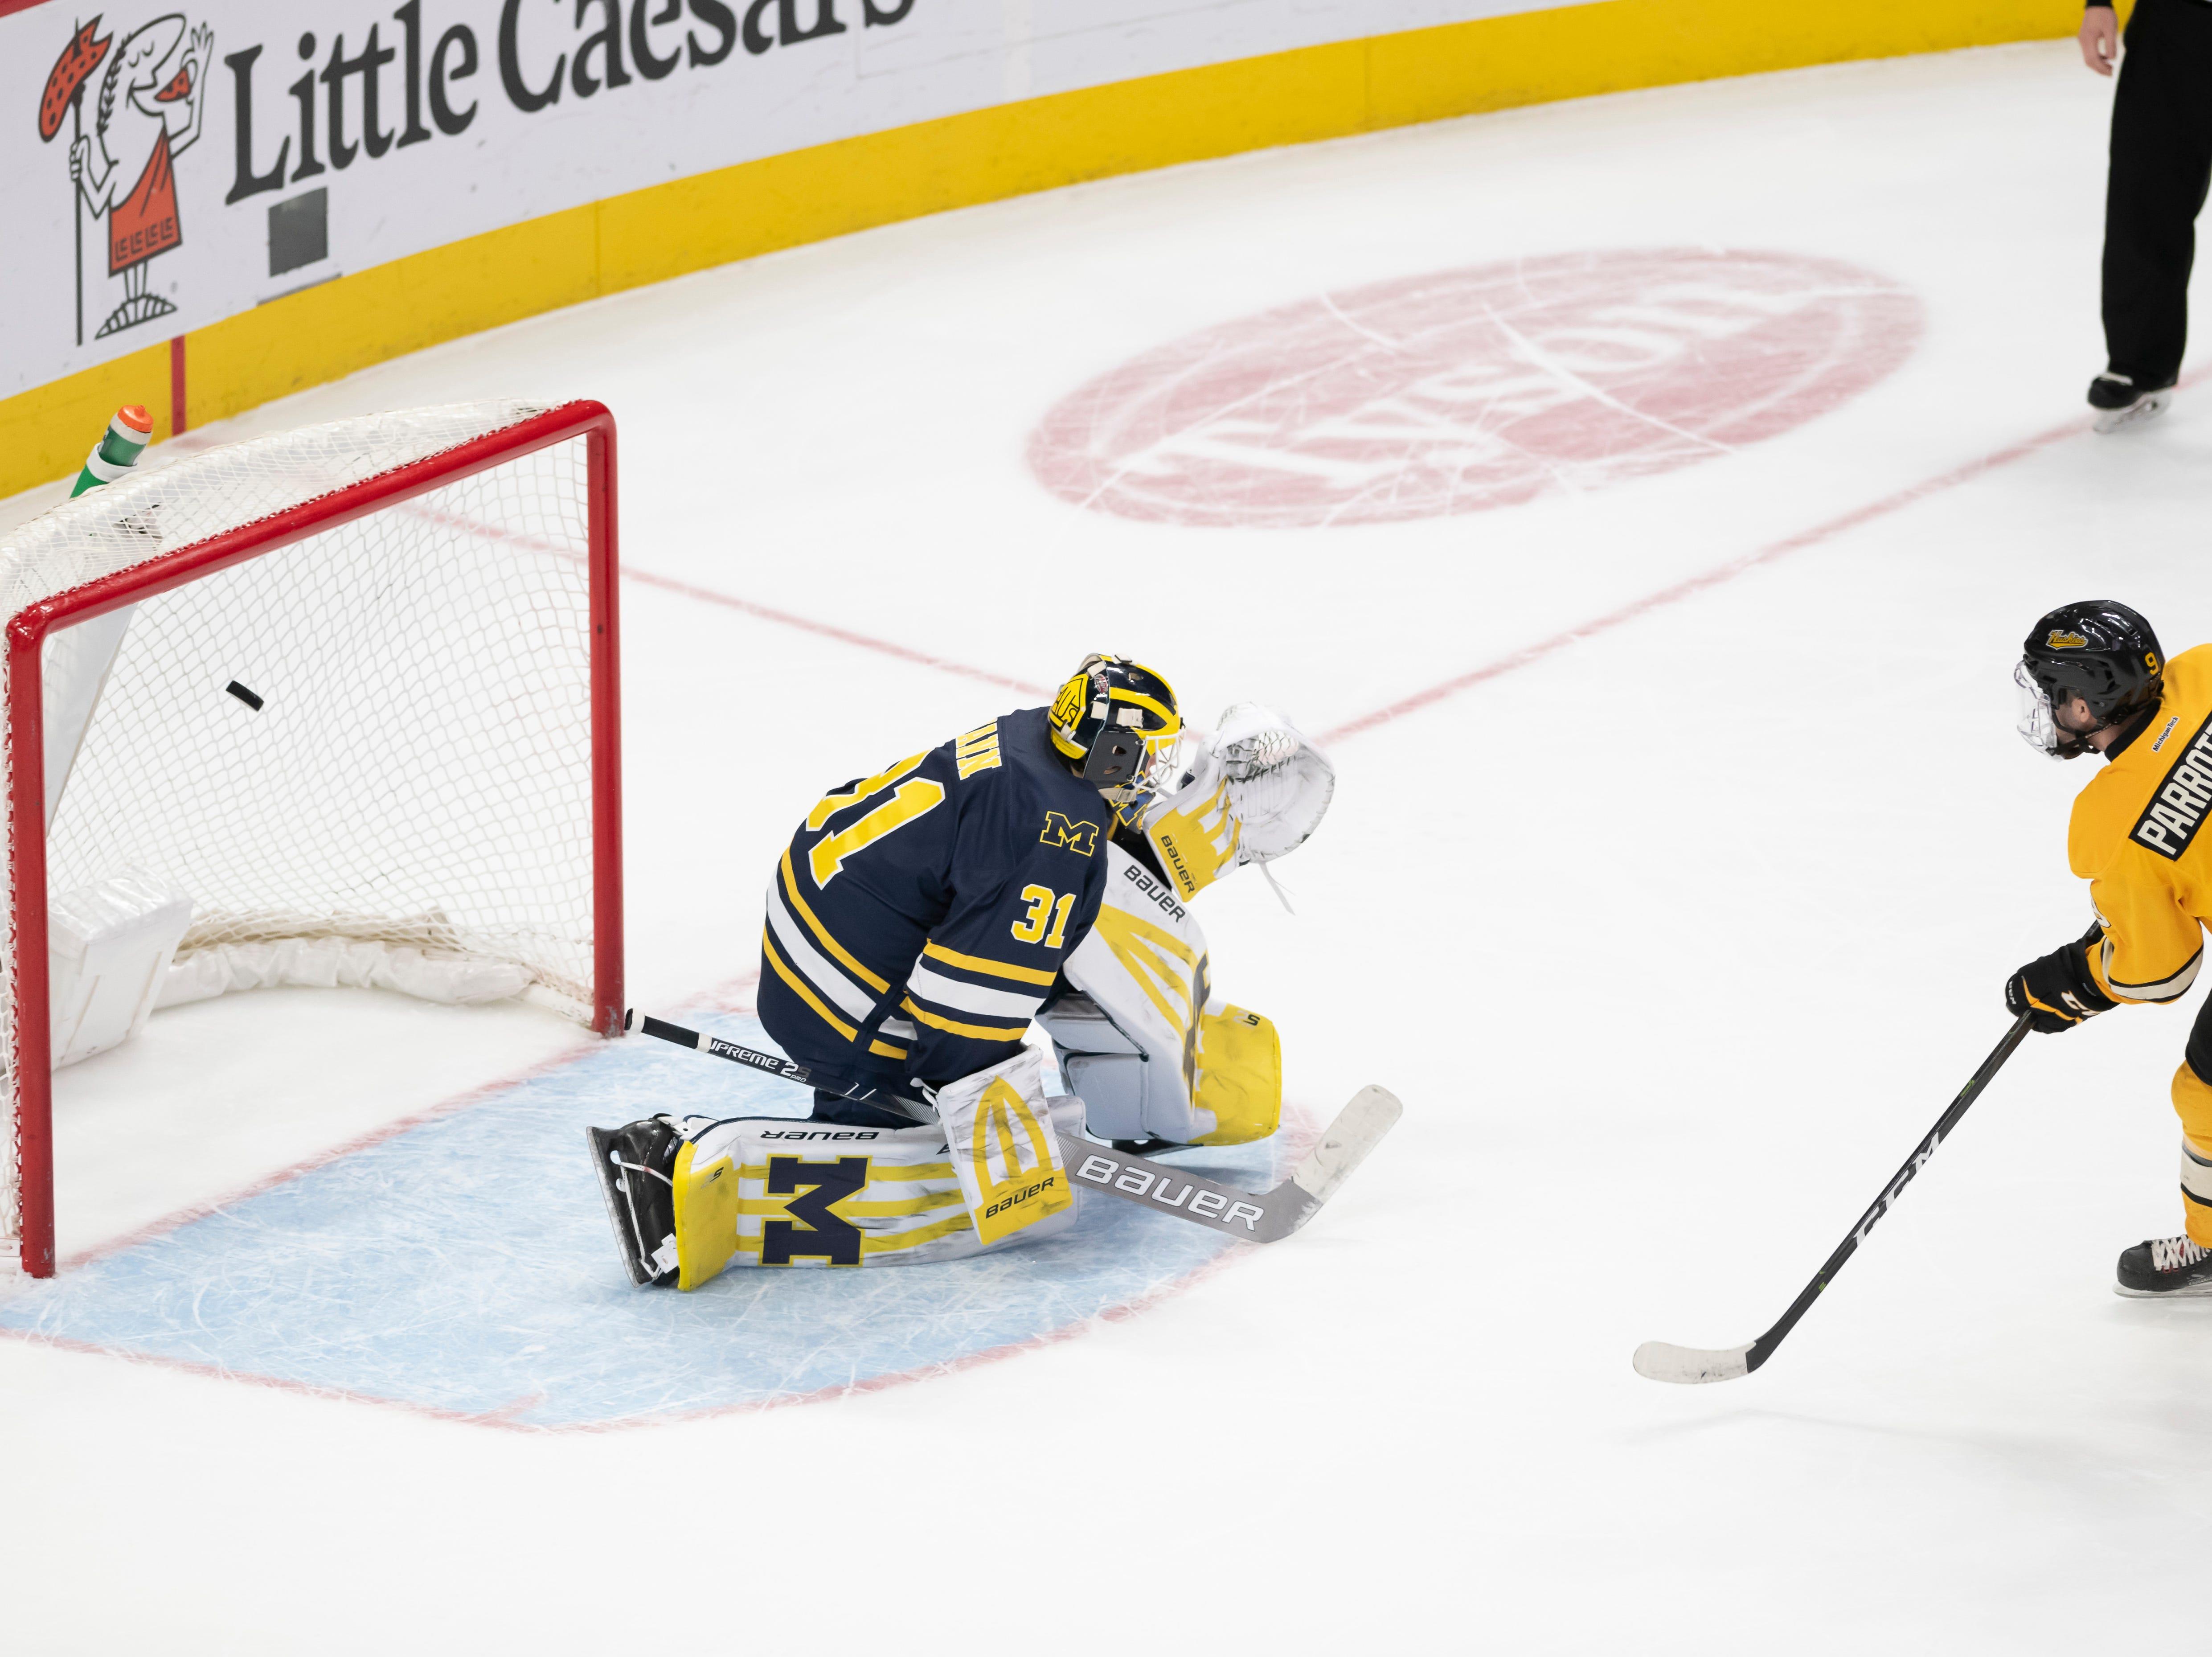 Michigan Tech forward Tommy Parrottino scores the game winning goal on Michigan goaltender Strauss Mann during the shootout.